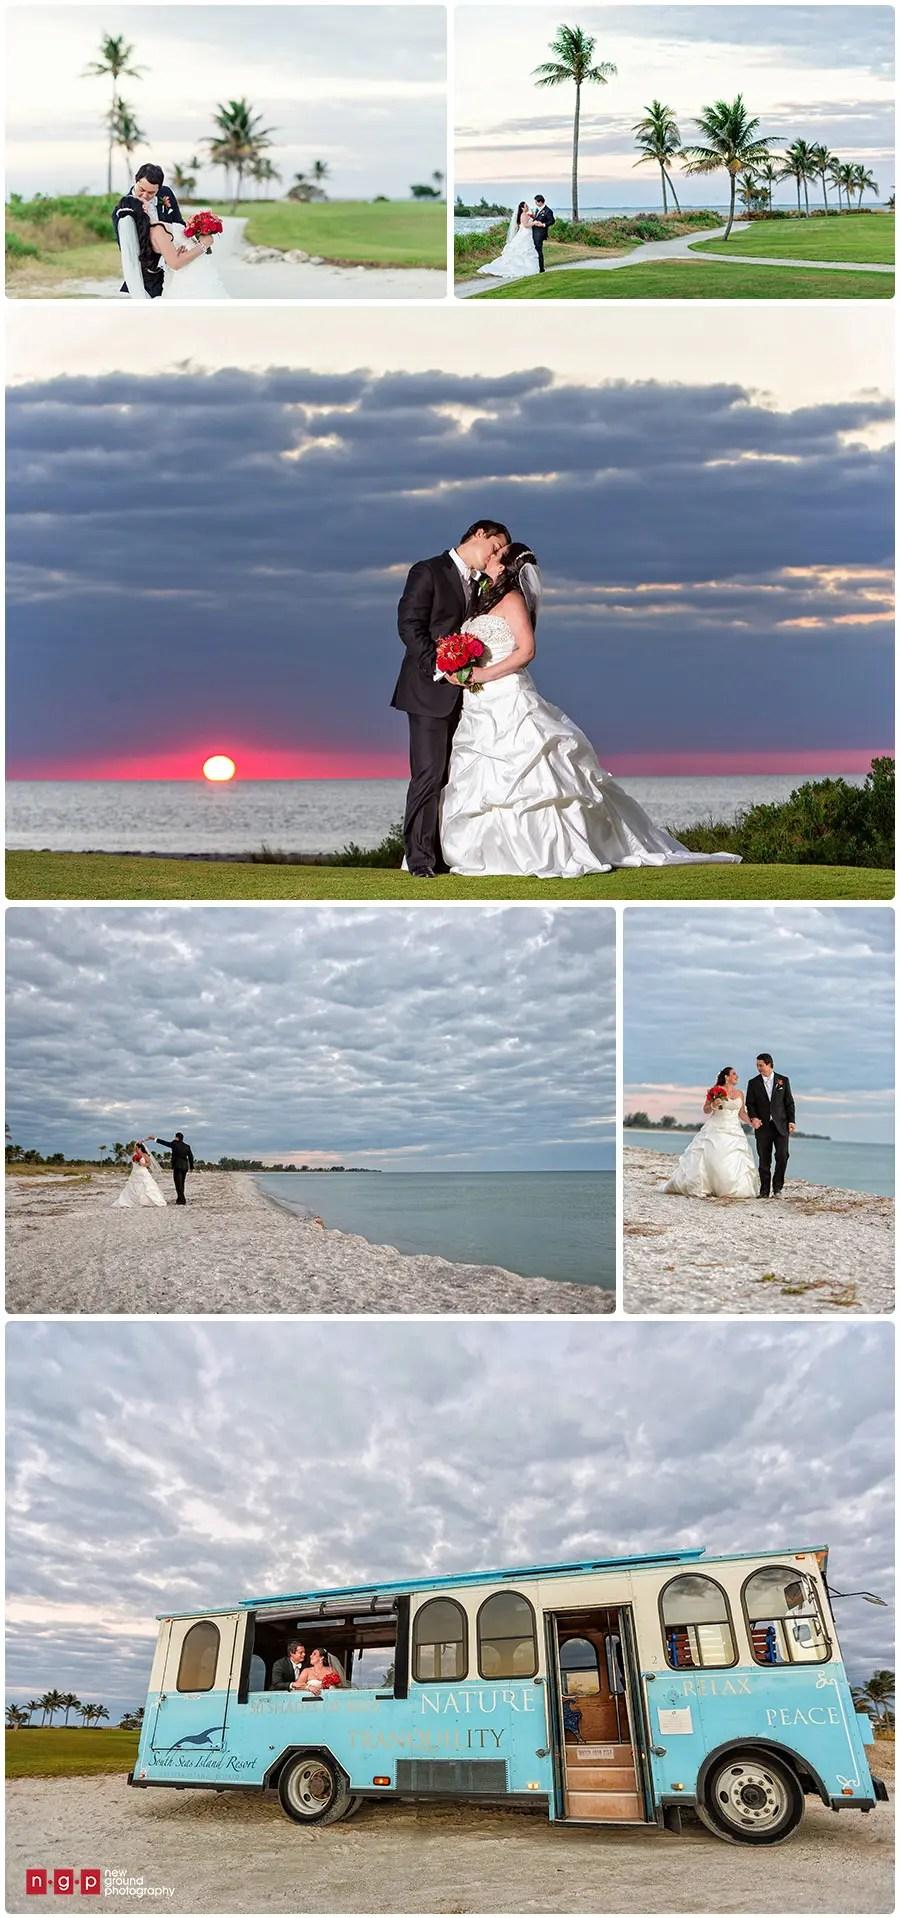 South Seas Resort Wedding  Corinne  Charles  Captiva Wedding Photography  Wedding